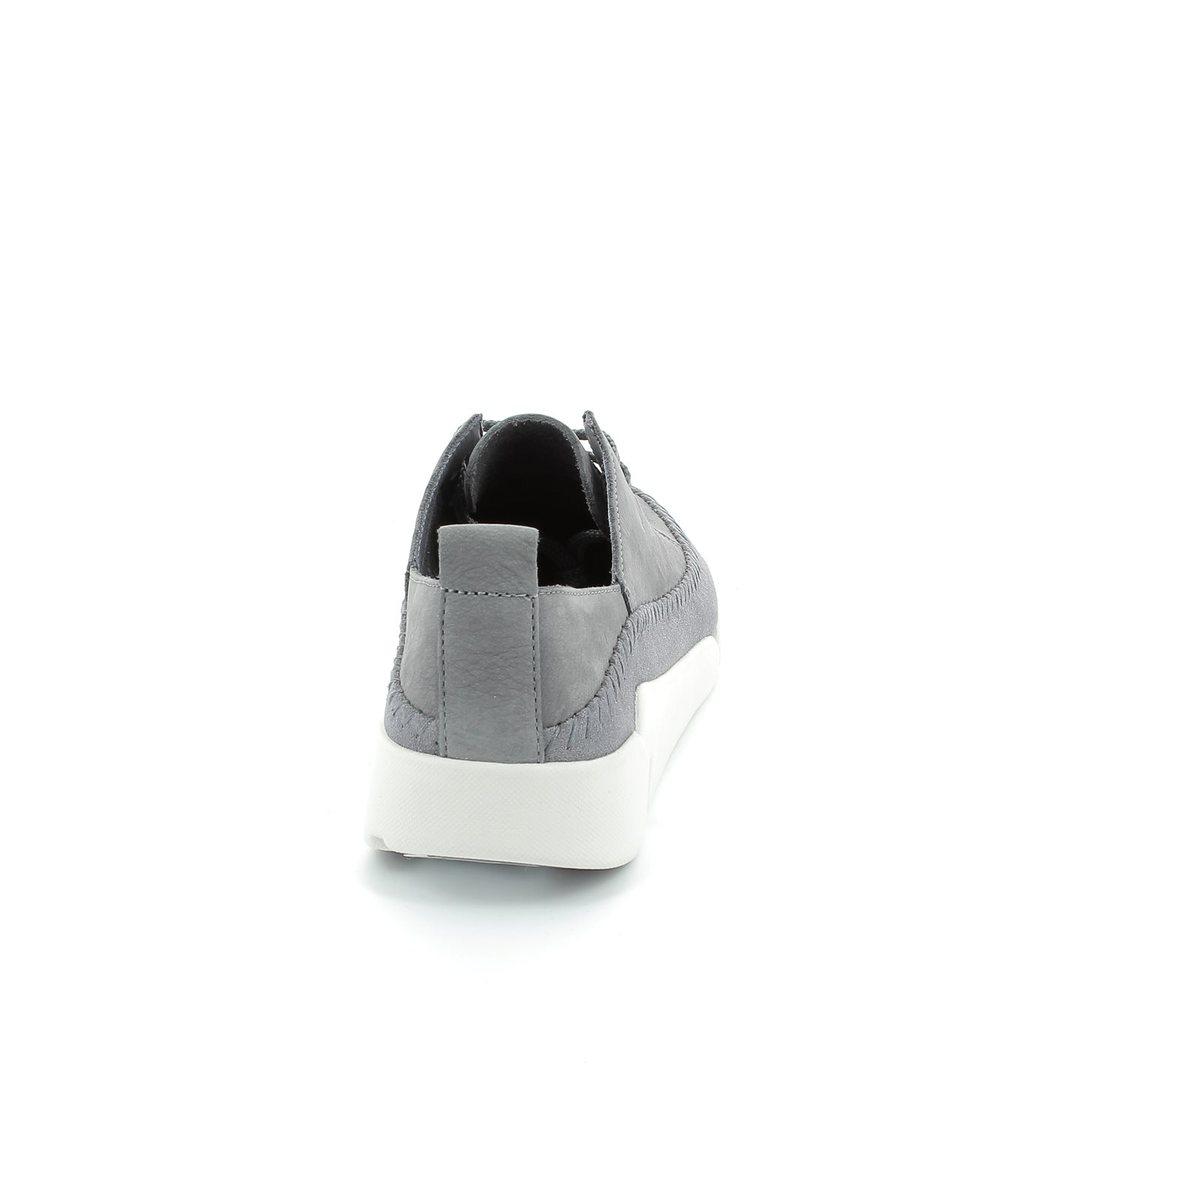 ac45fbc4e2e Clarks Lacing Shoes - Denim blue - 1564 04D TRI ANGEL